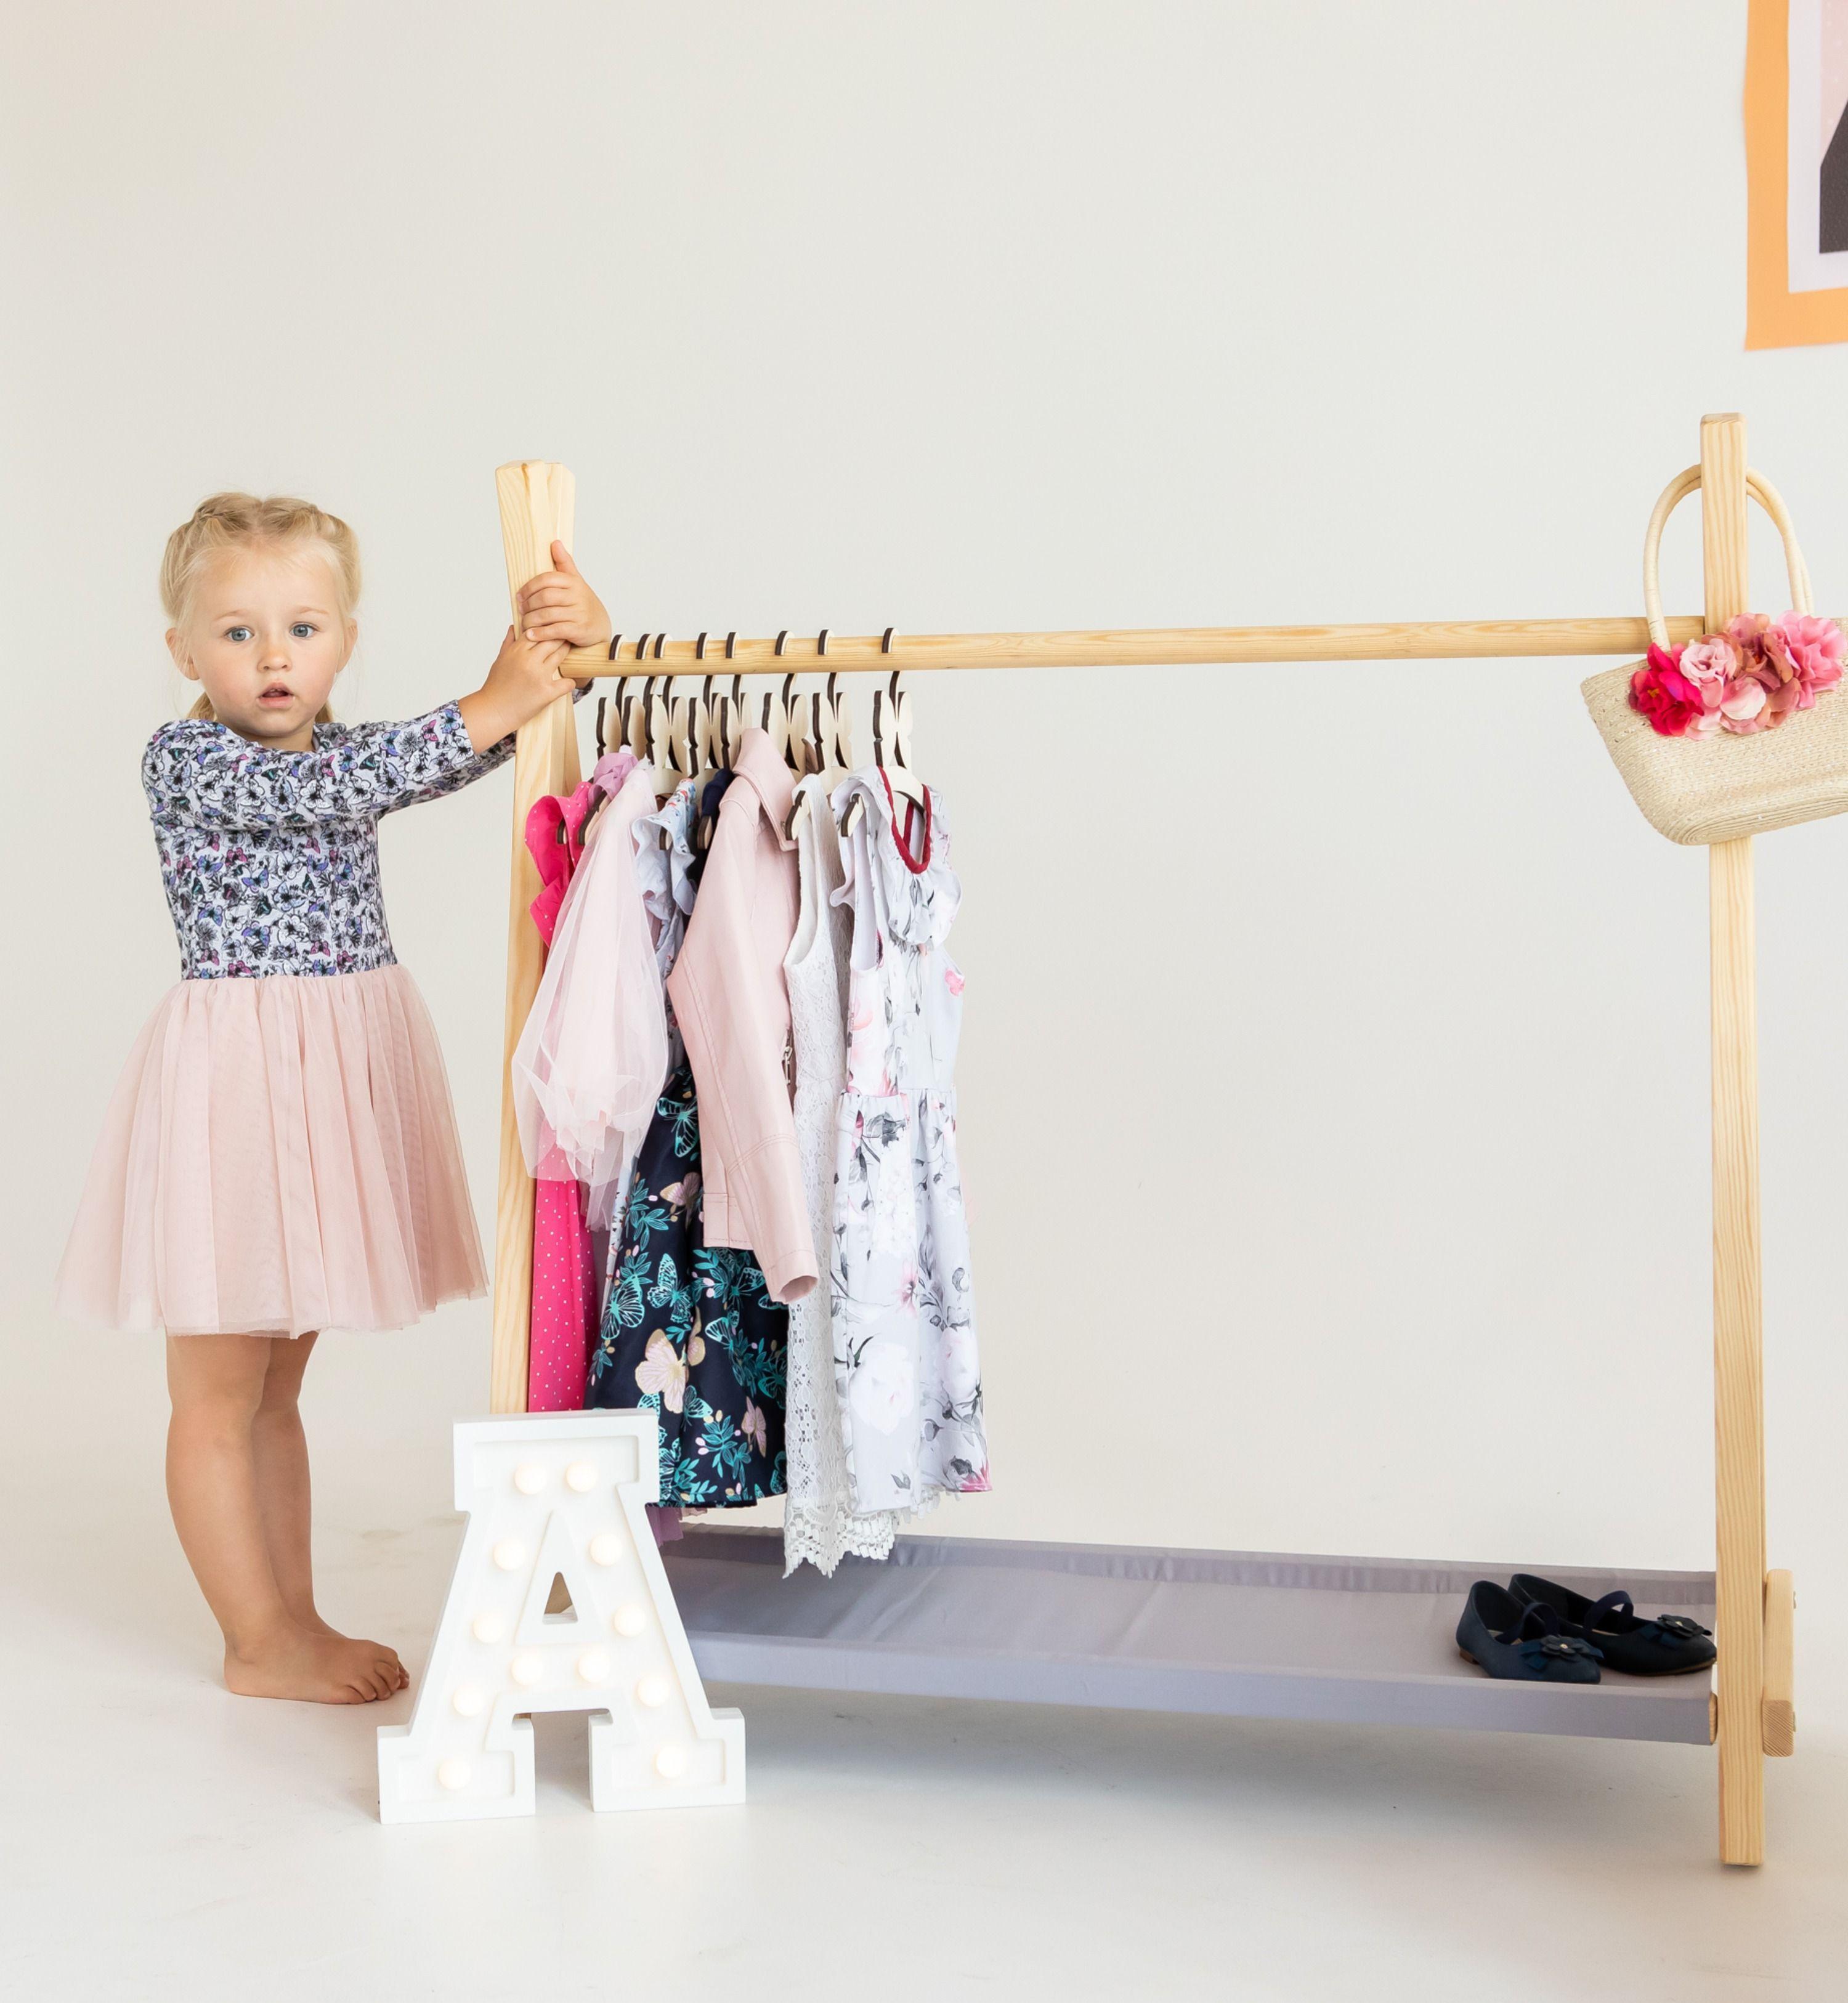 Kids Clothing Rack Wooden Rack Hanging Rack Clothes Rack